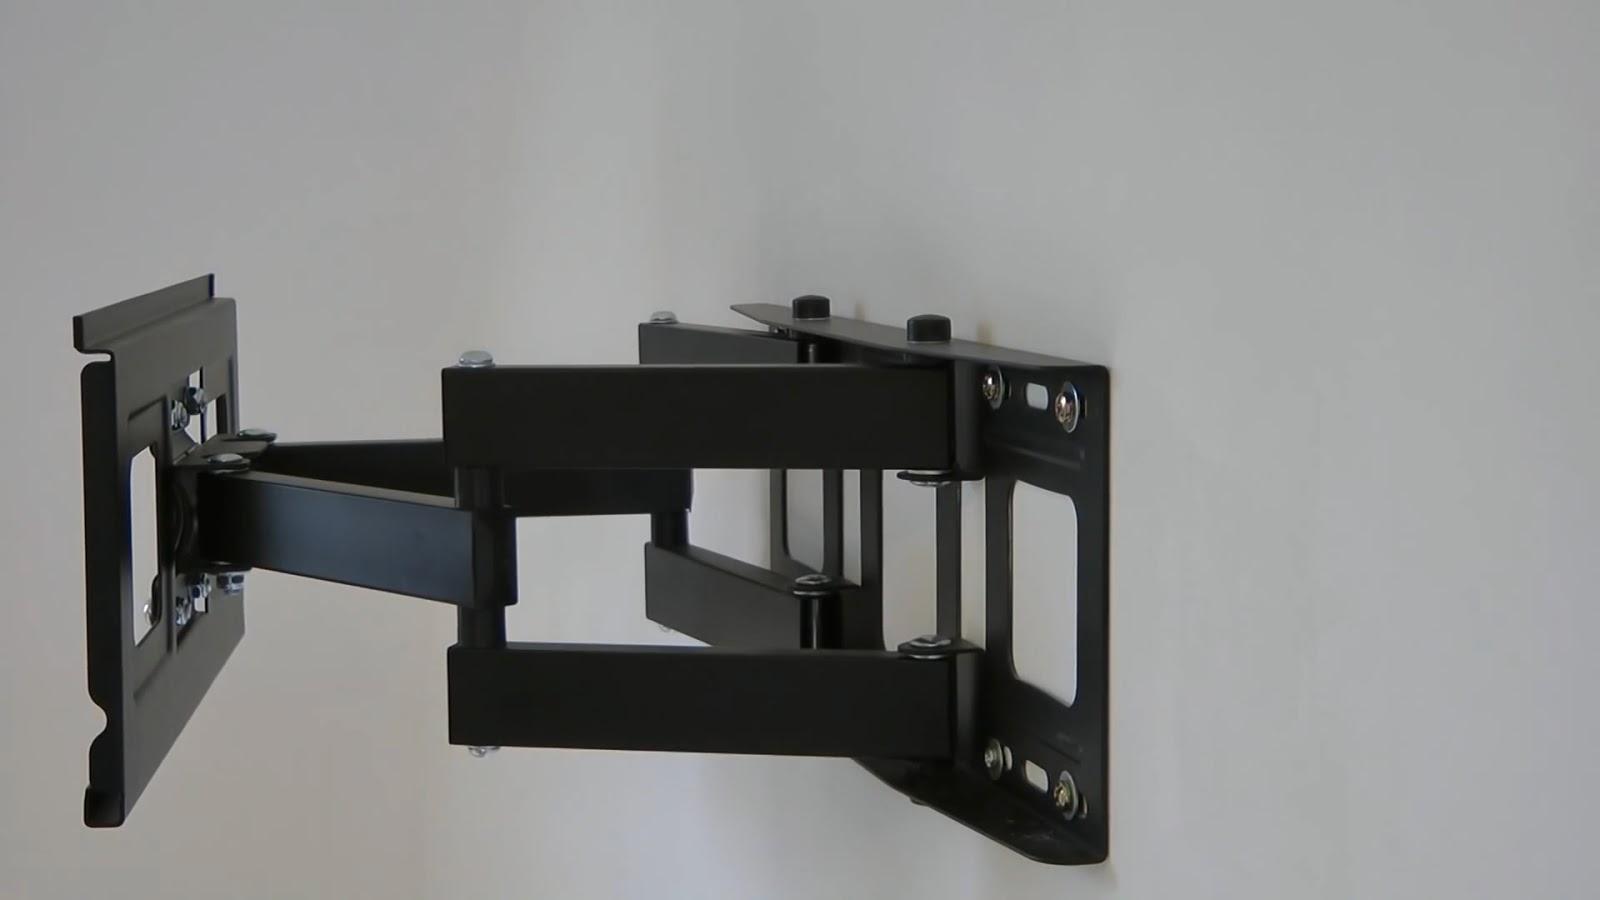 fixer un support mural pour tv tuto support mural sur placo. Black Bedroom Furniture Sets. Home Design Ideas